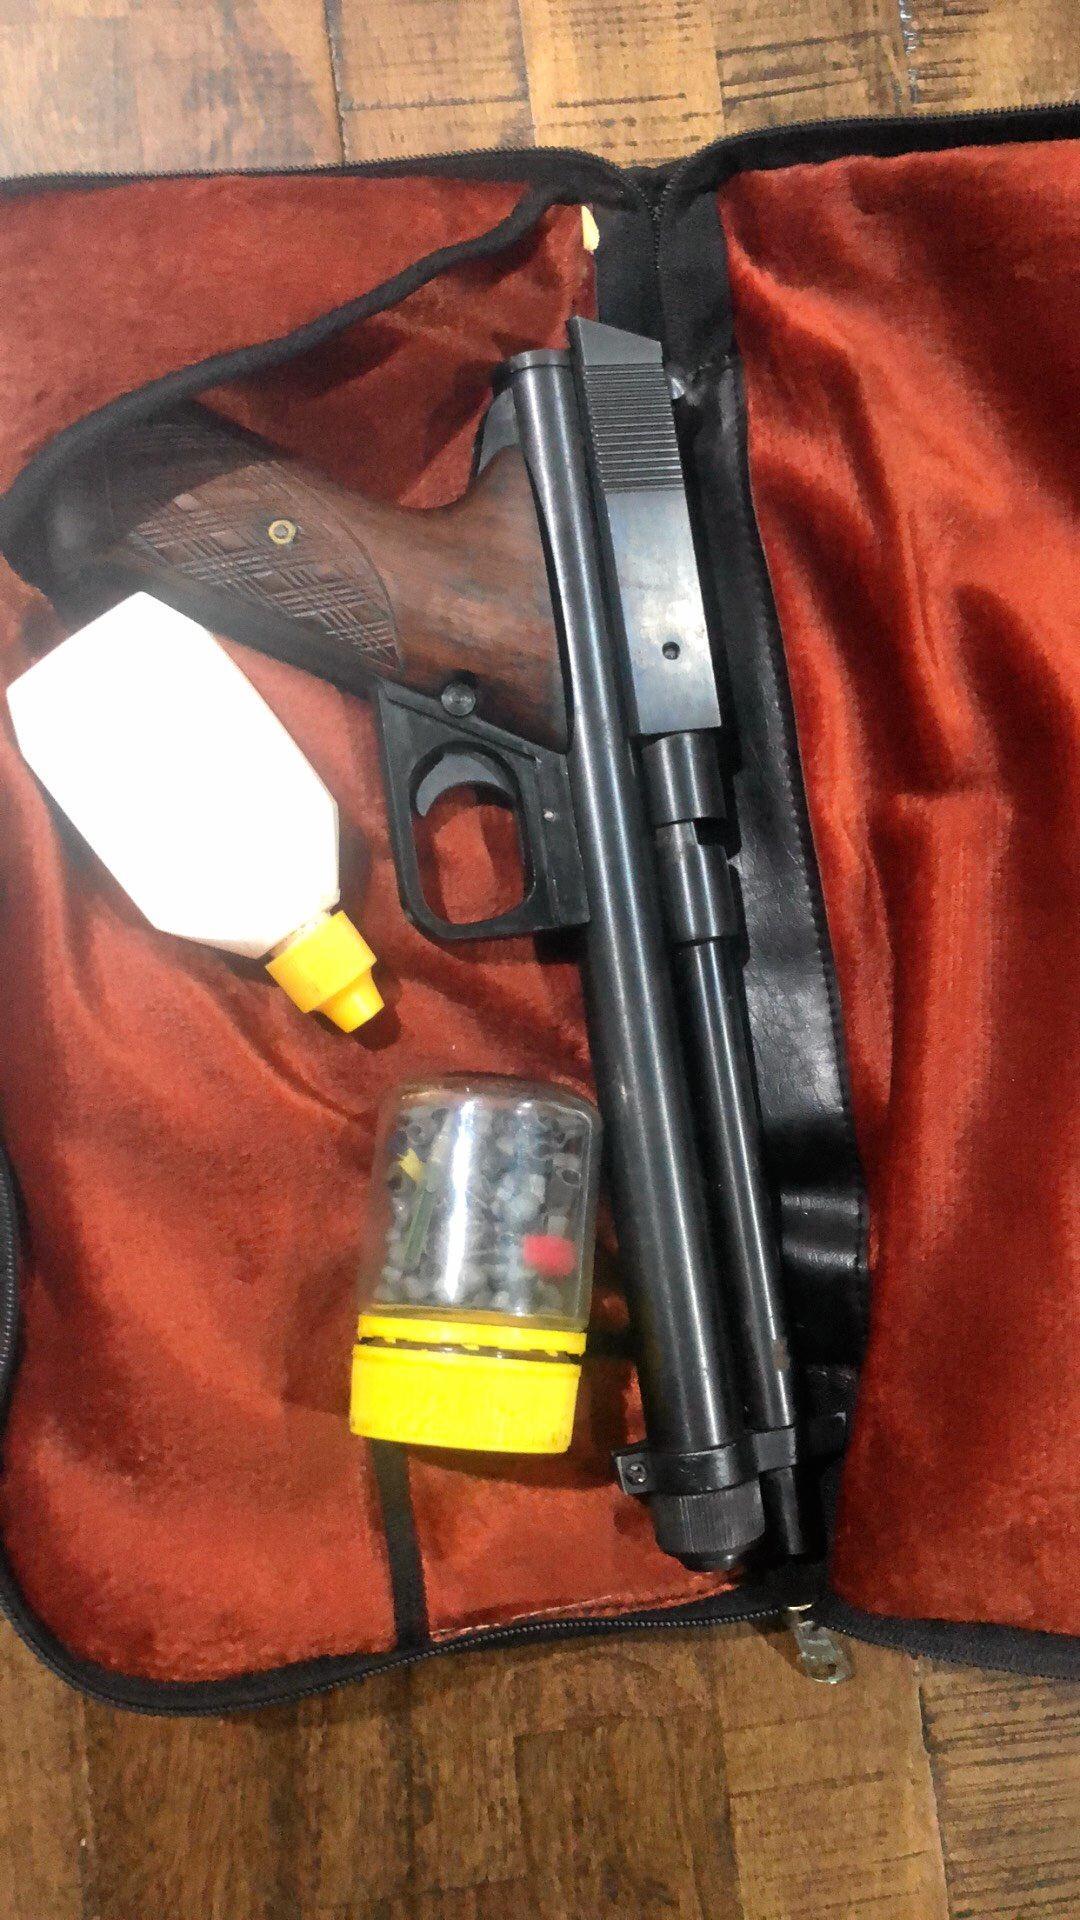 A BB gun and drugs.